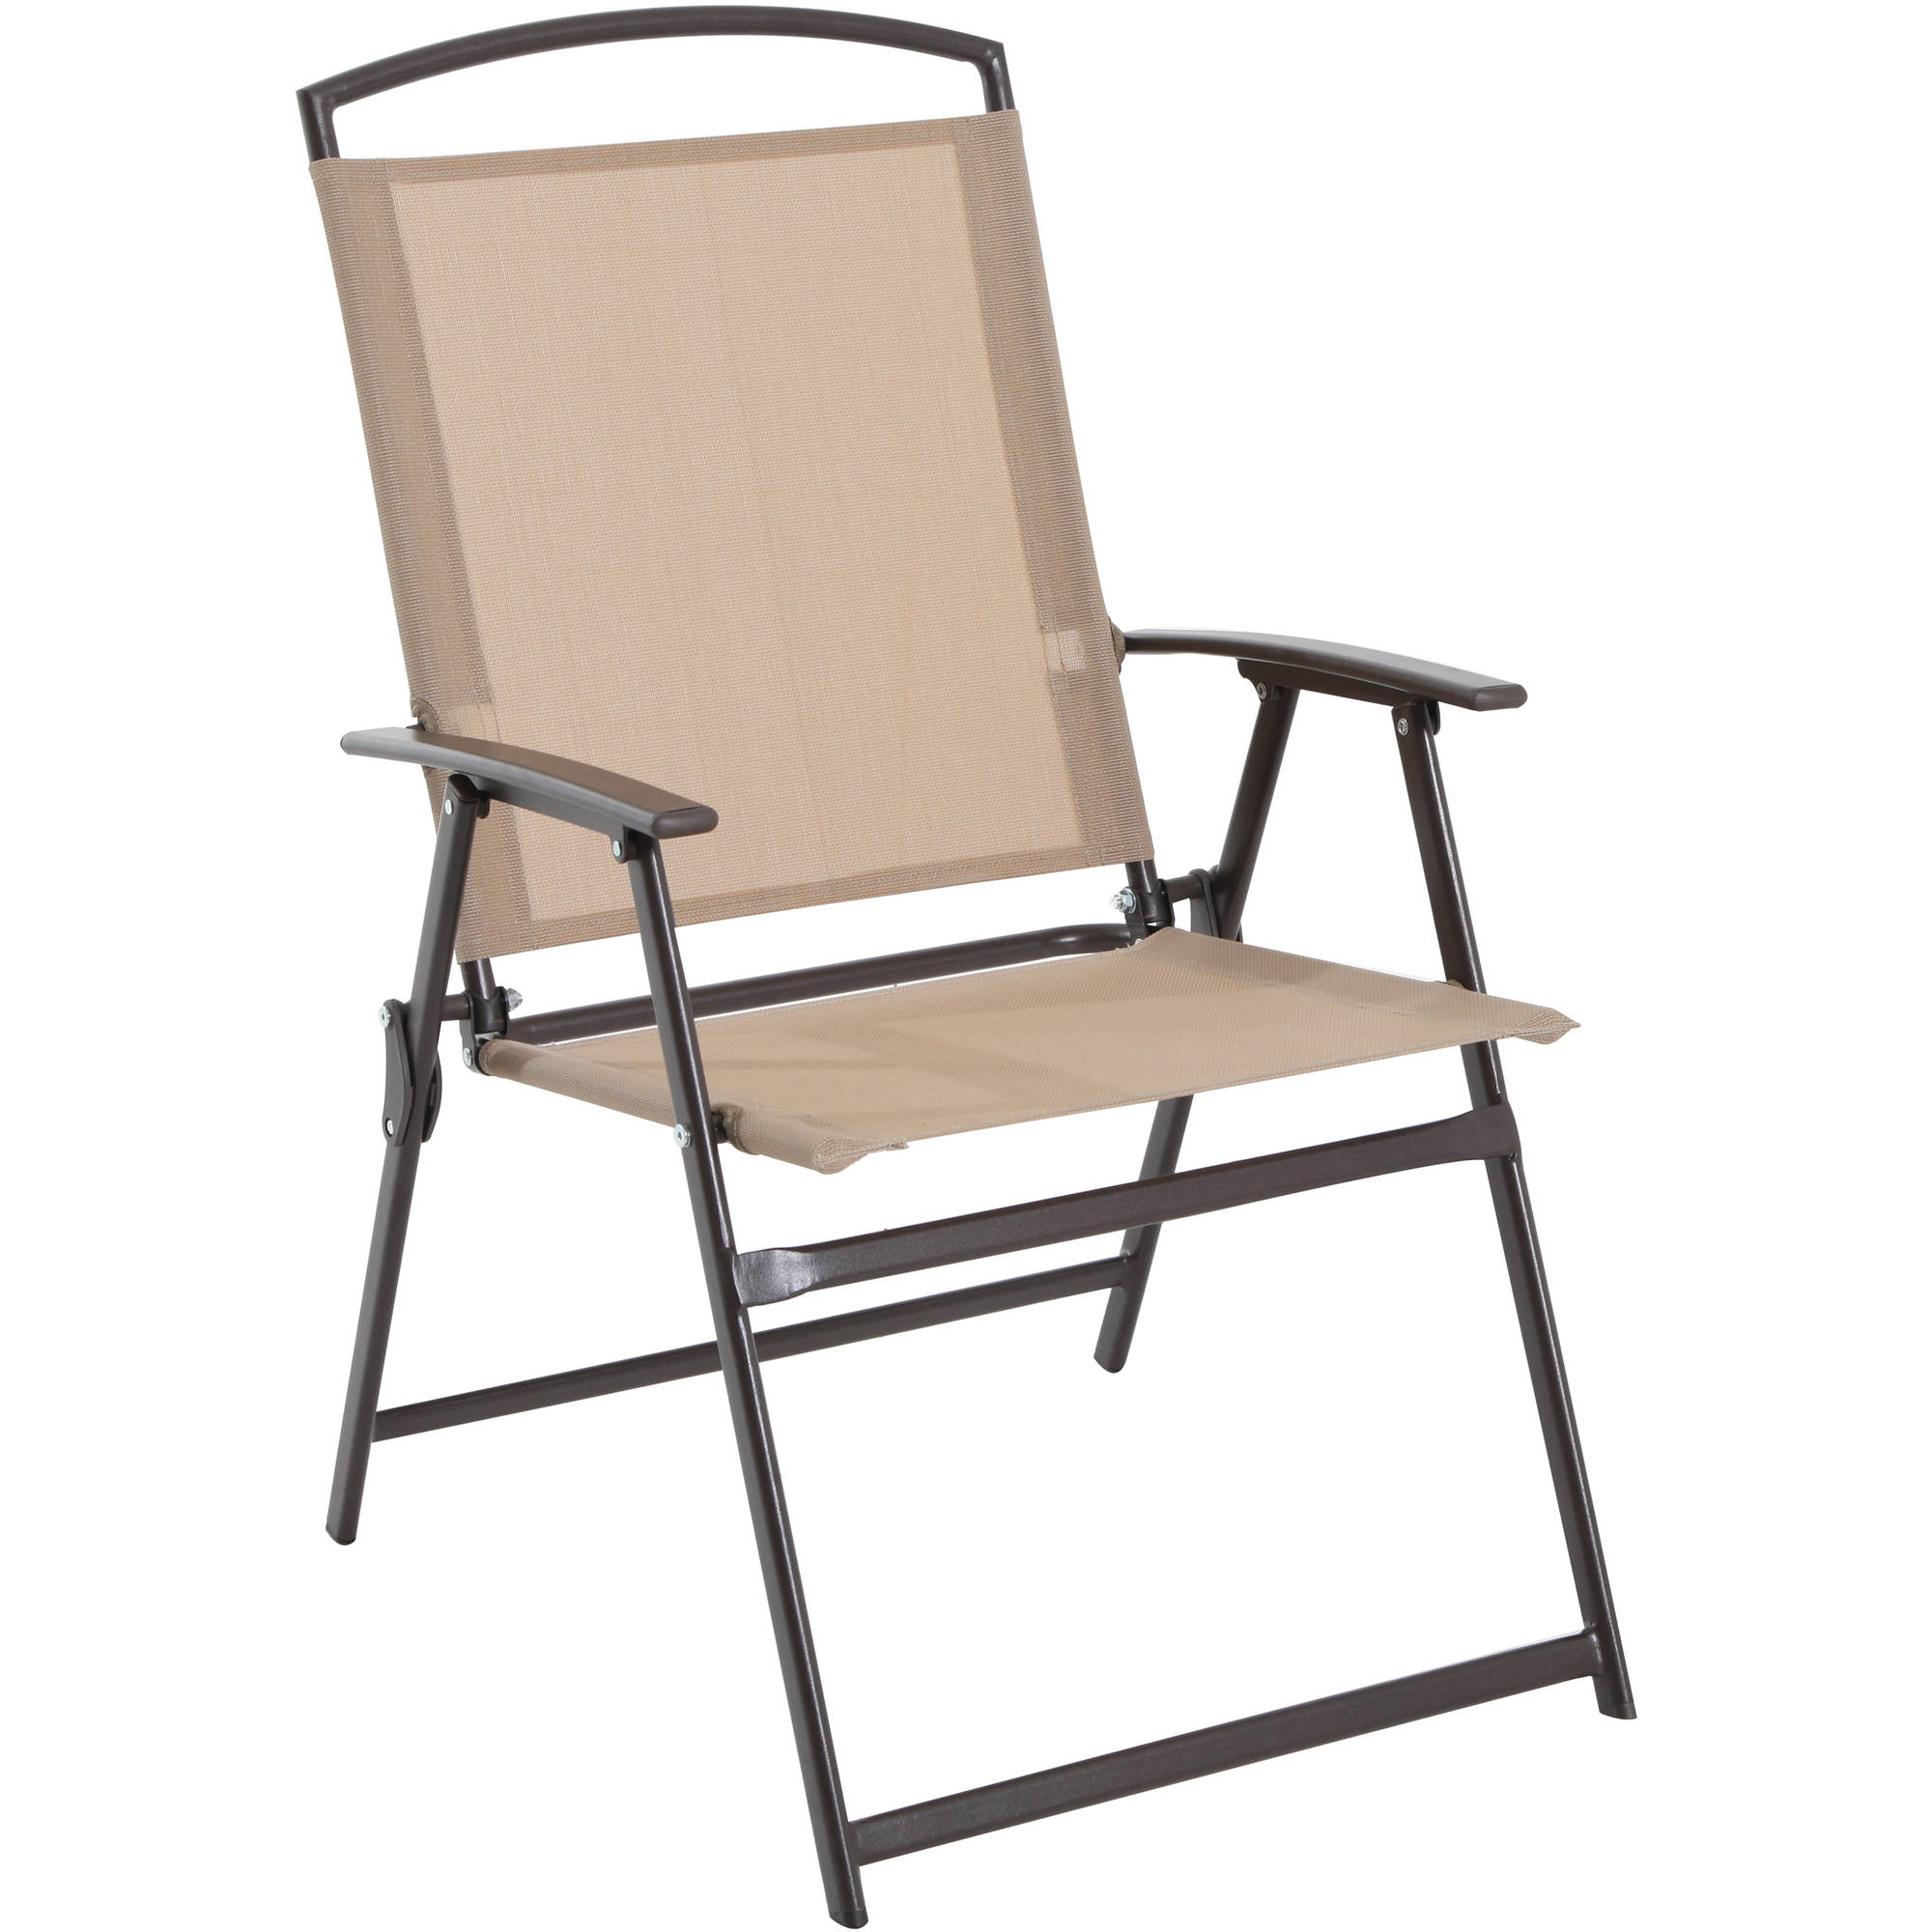 mainstays albany lane 6 piece folding dining set tan umbrella patio set. Black Bedroom Furniture Sets. Home Design Ideas